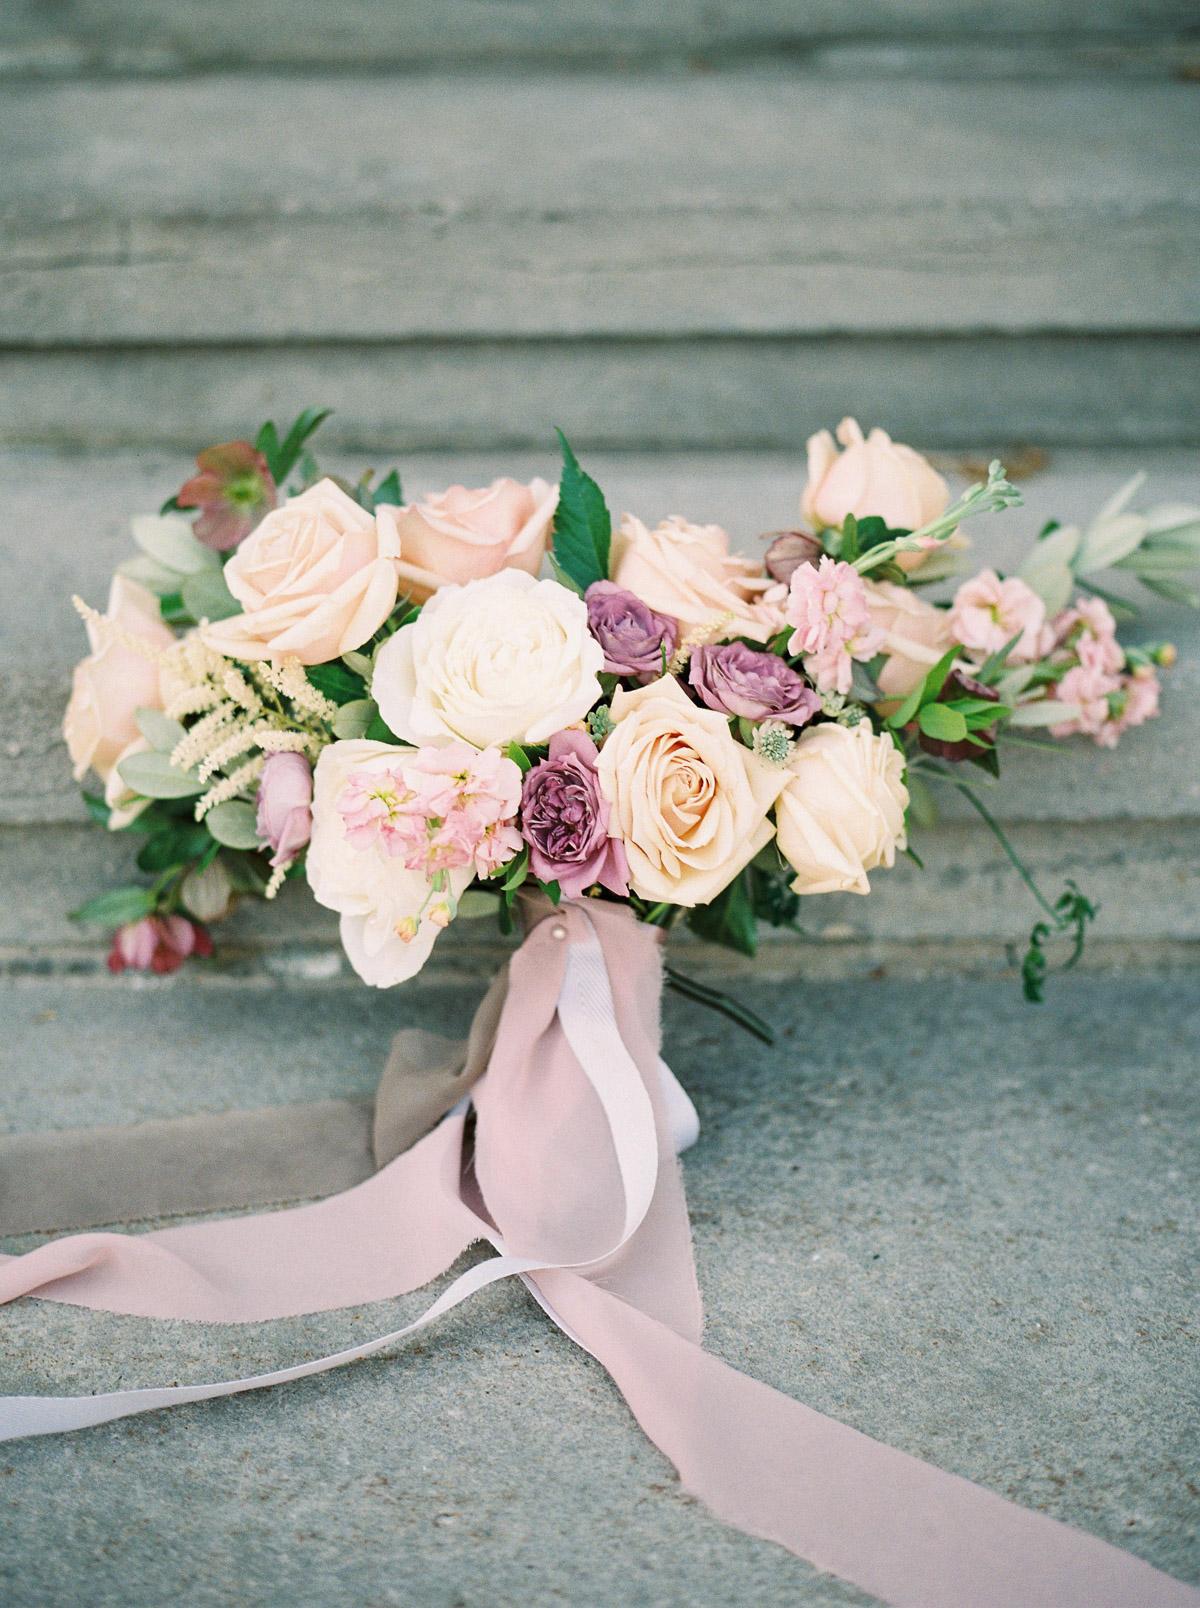 julia-park-photography-vineyard-bride-swish-list-niagara-on-the-lake-wedding-editorial-12.jpg